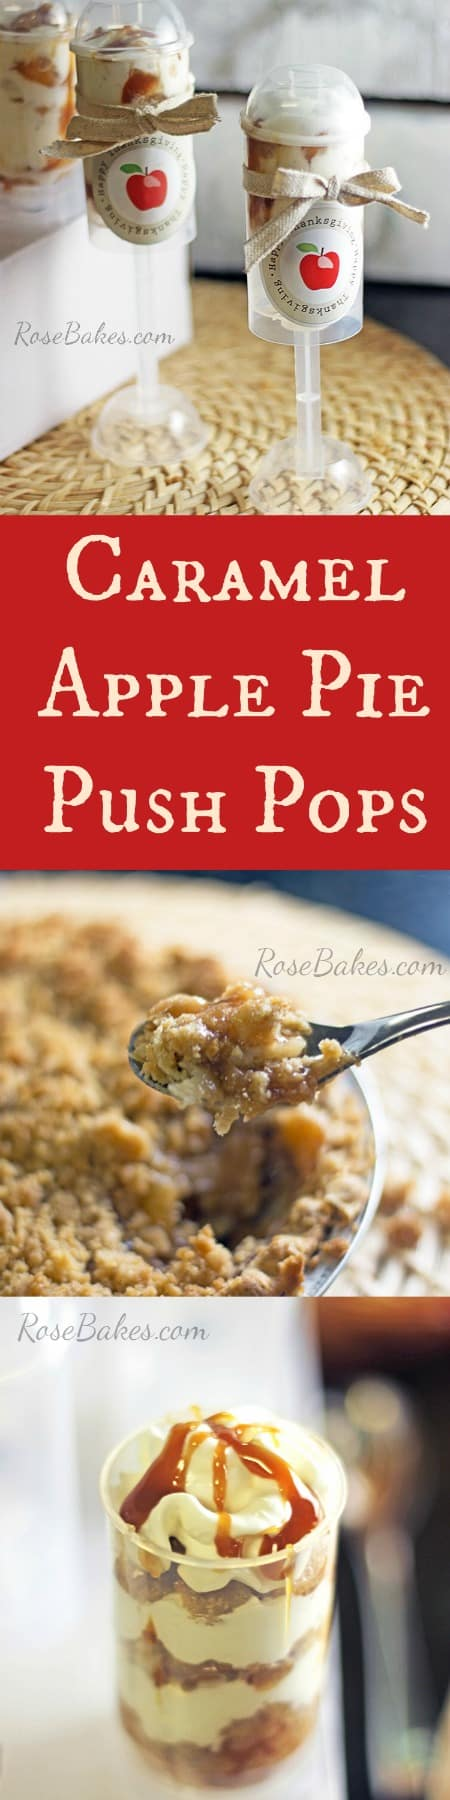 Caramel Apple Pie Push Pops RoseBakes.com. Click over for the recipe & free printable!